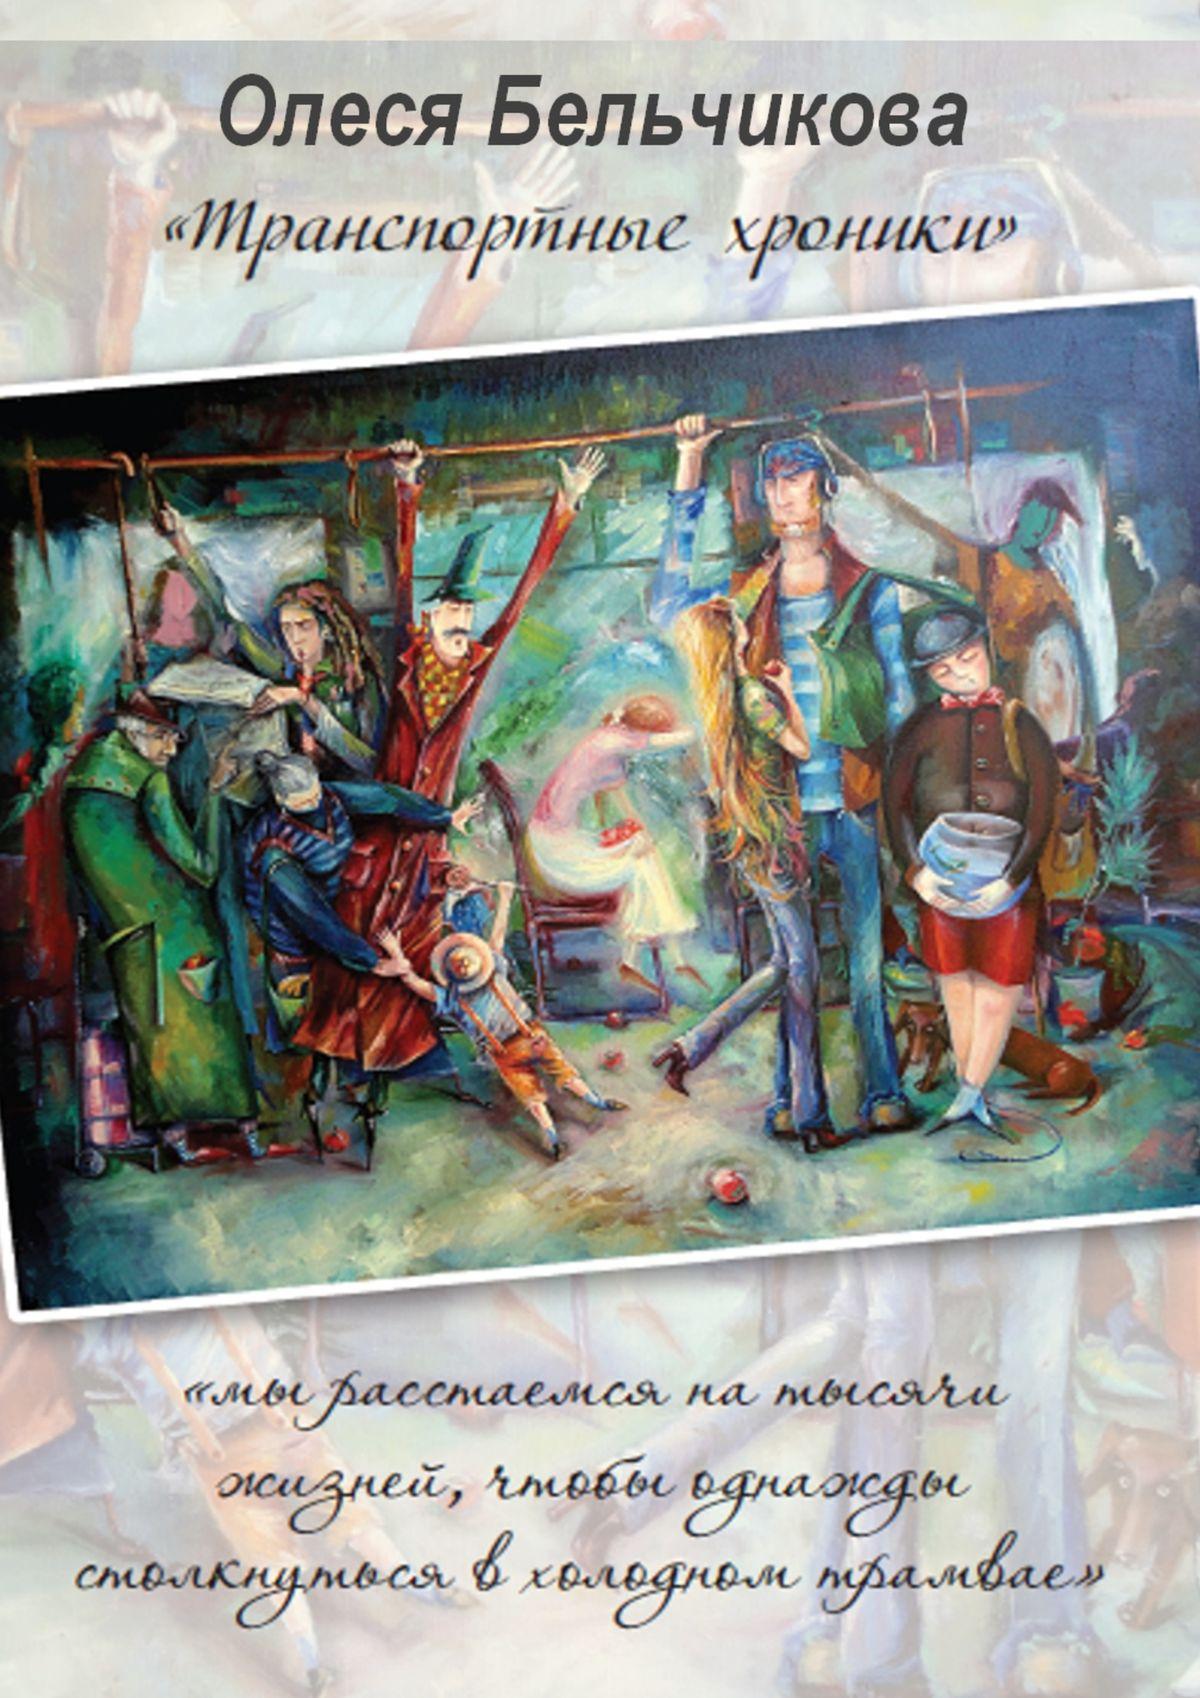 Олеся Бельчикова Транспортные хроники александра борисовна киселёва истории – мои территории стихи